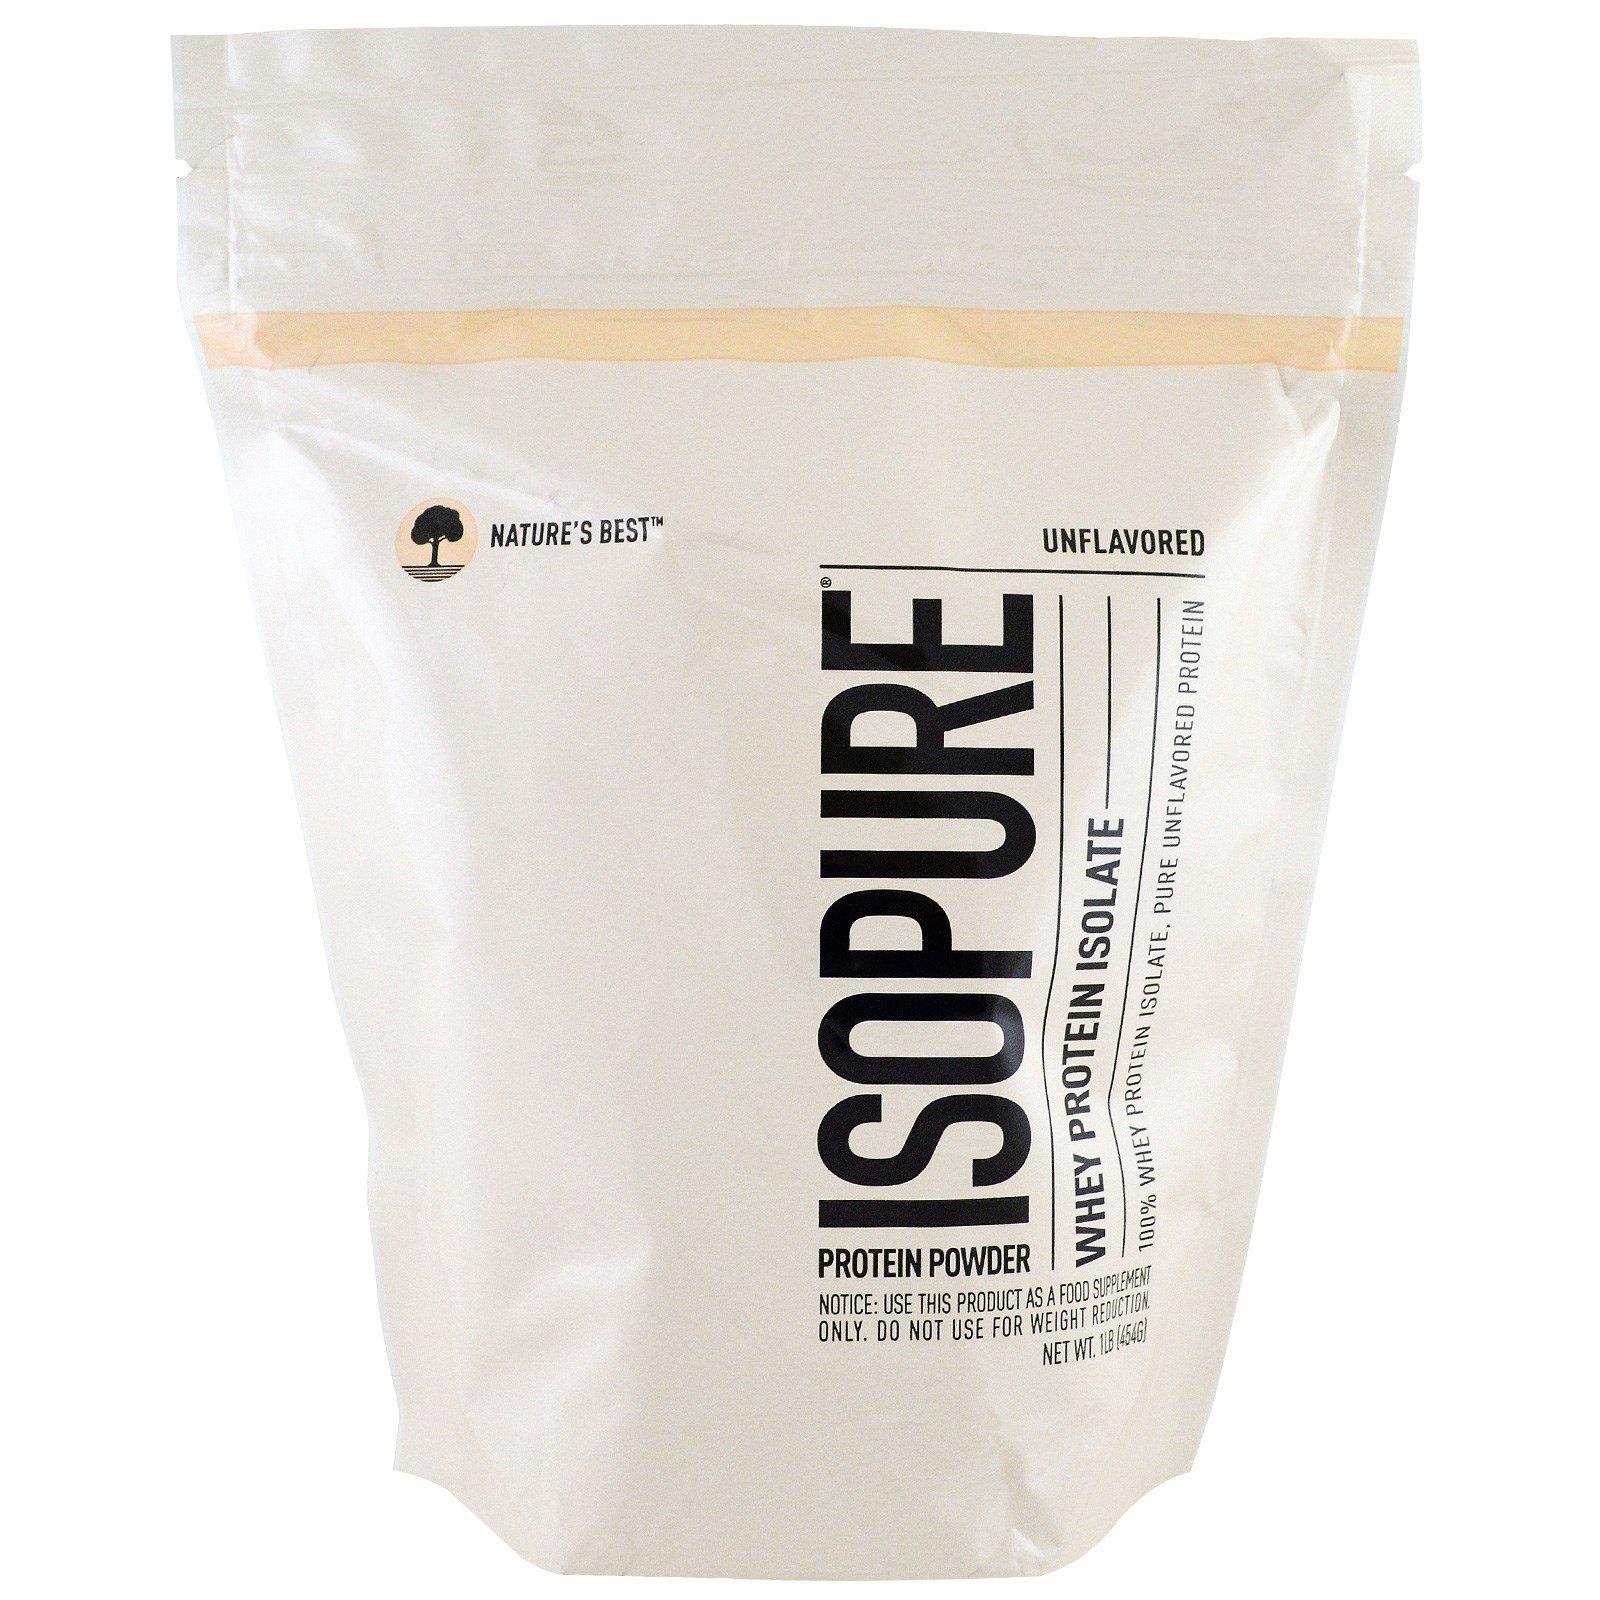 Nature's Best, IsoPure, IsoPure, изолят сывороточного протеина, протеиновый порошок, без ароматизаторов, 1 фунт (454 г)